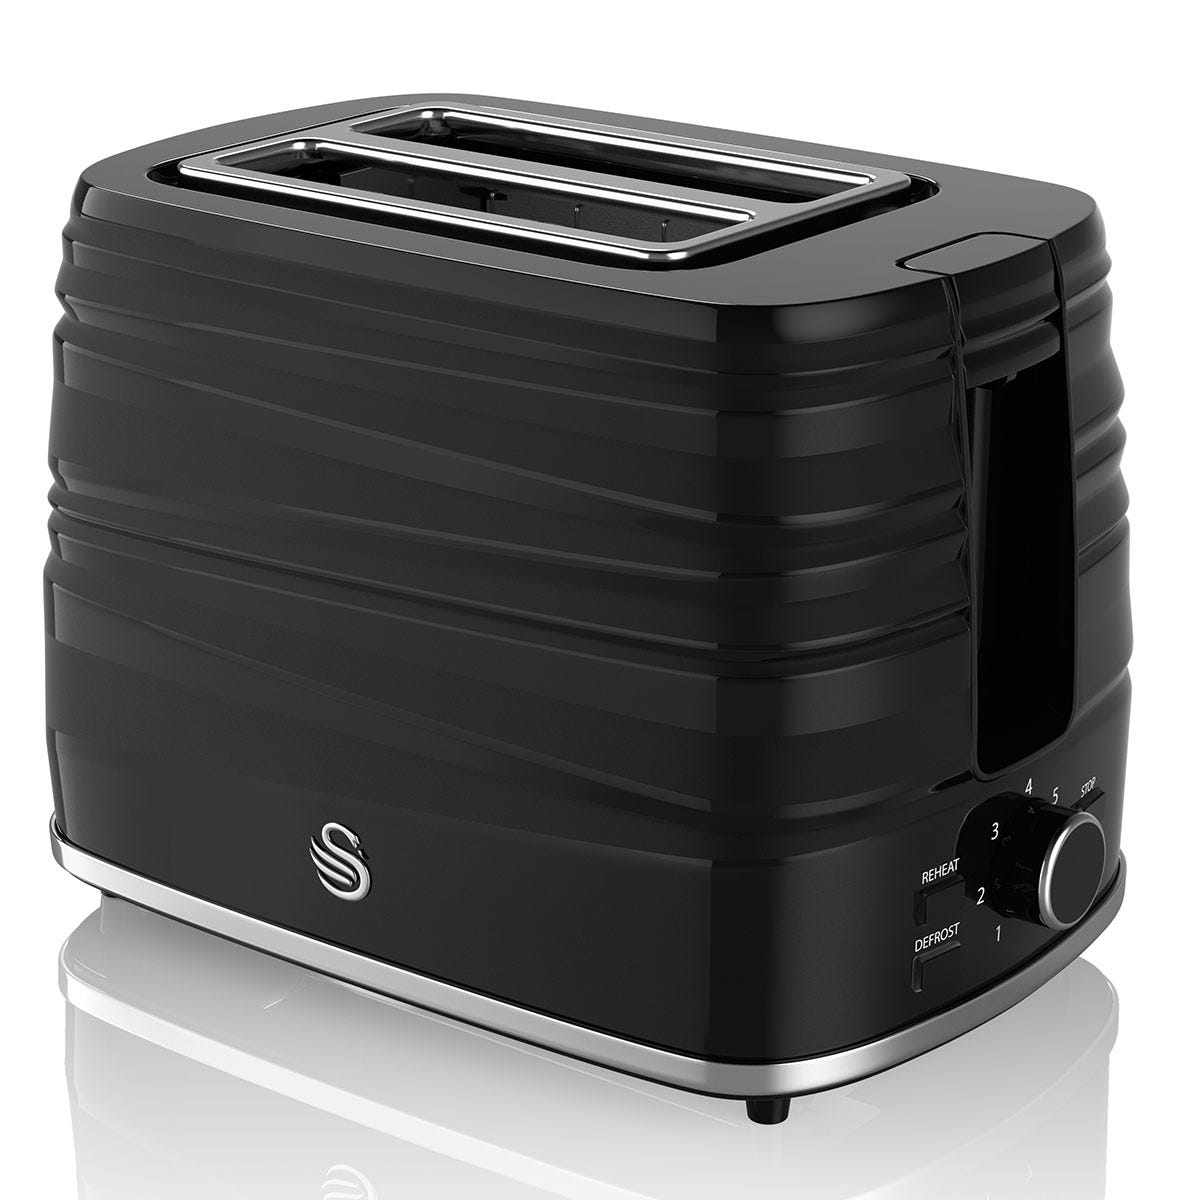 Swan ST31050BN 2-Slice Toaster - Black